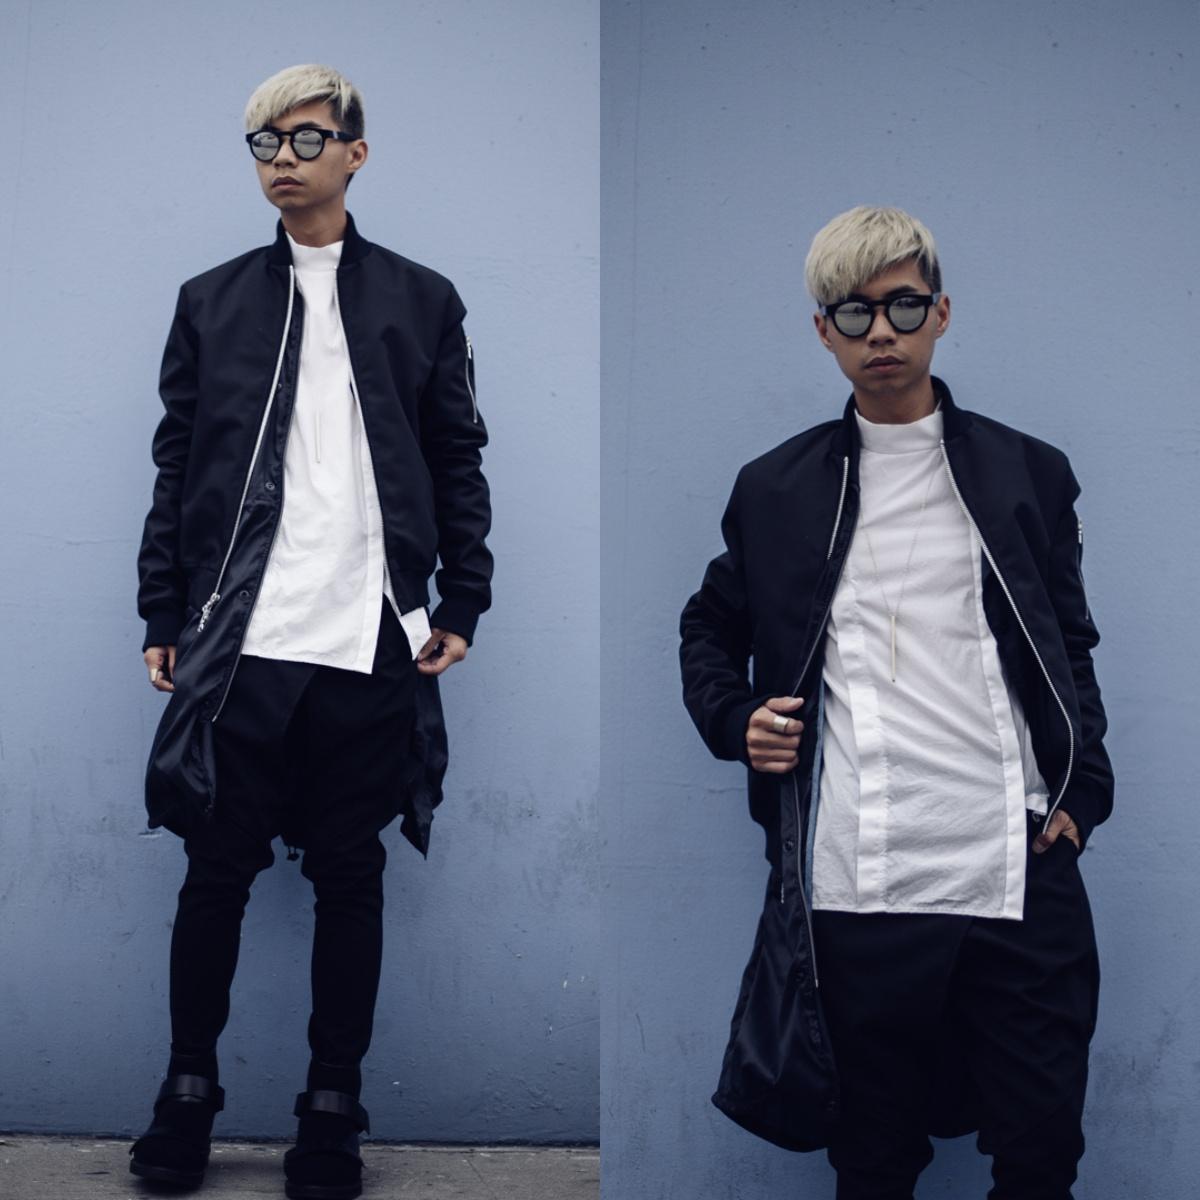 mybelonging-tommylei-3paradis-streetstyle-menswear-highfashion-collage2.jpg